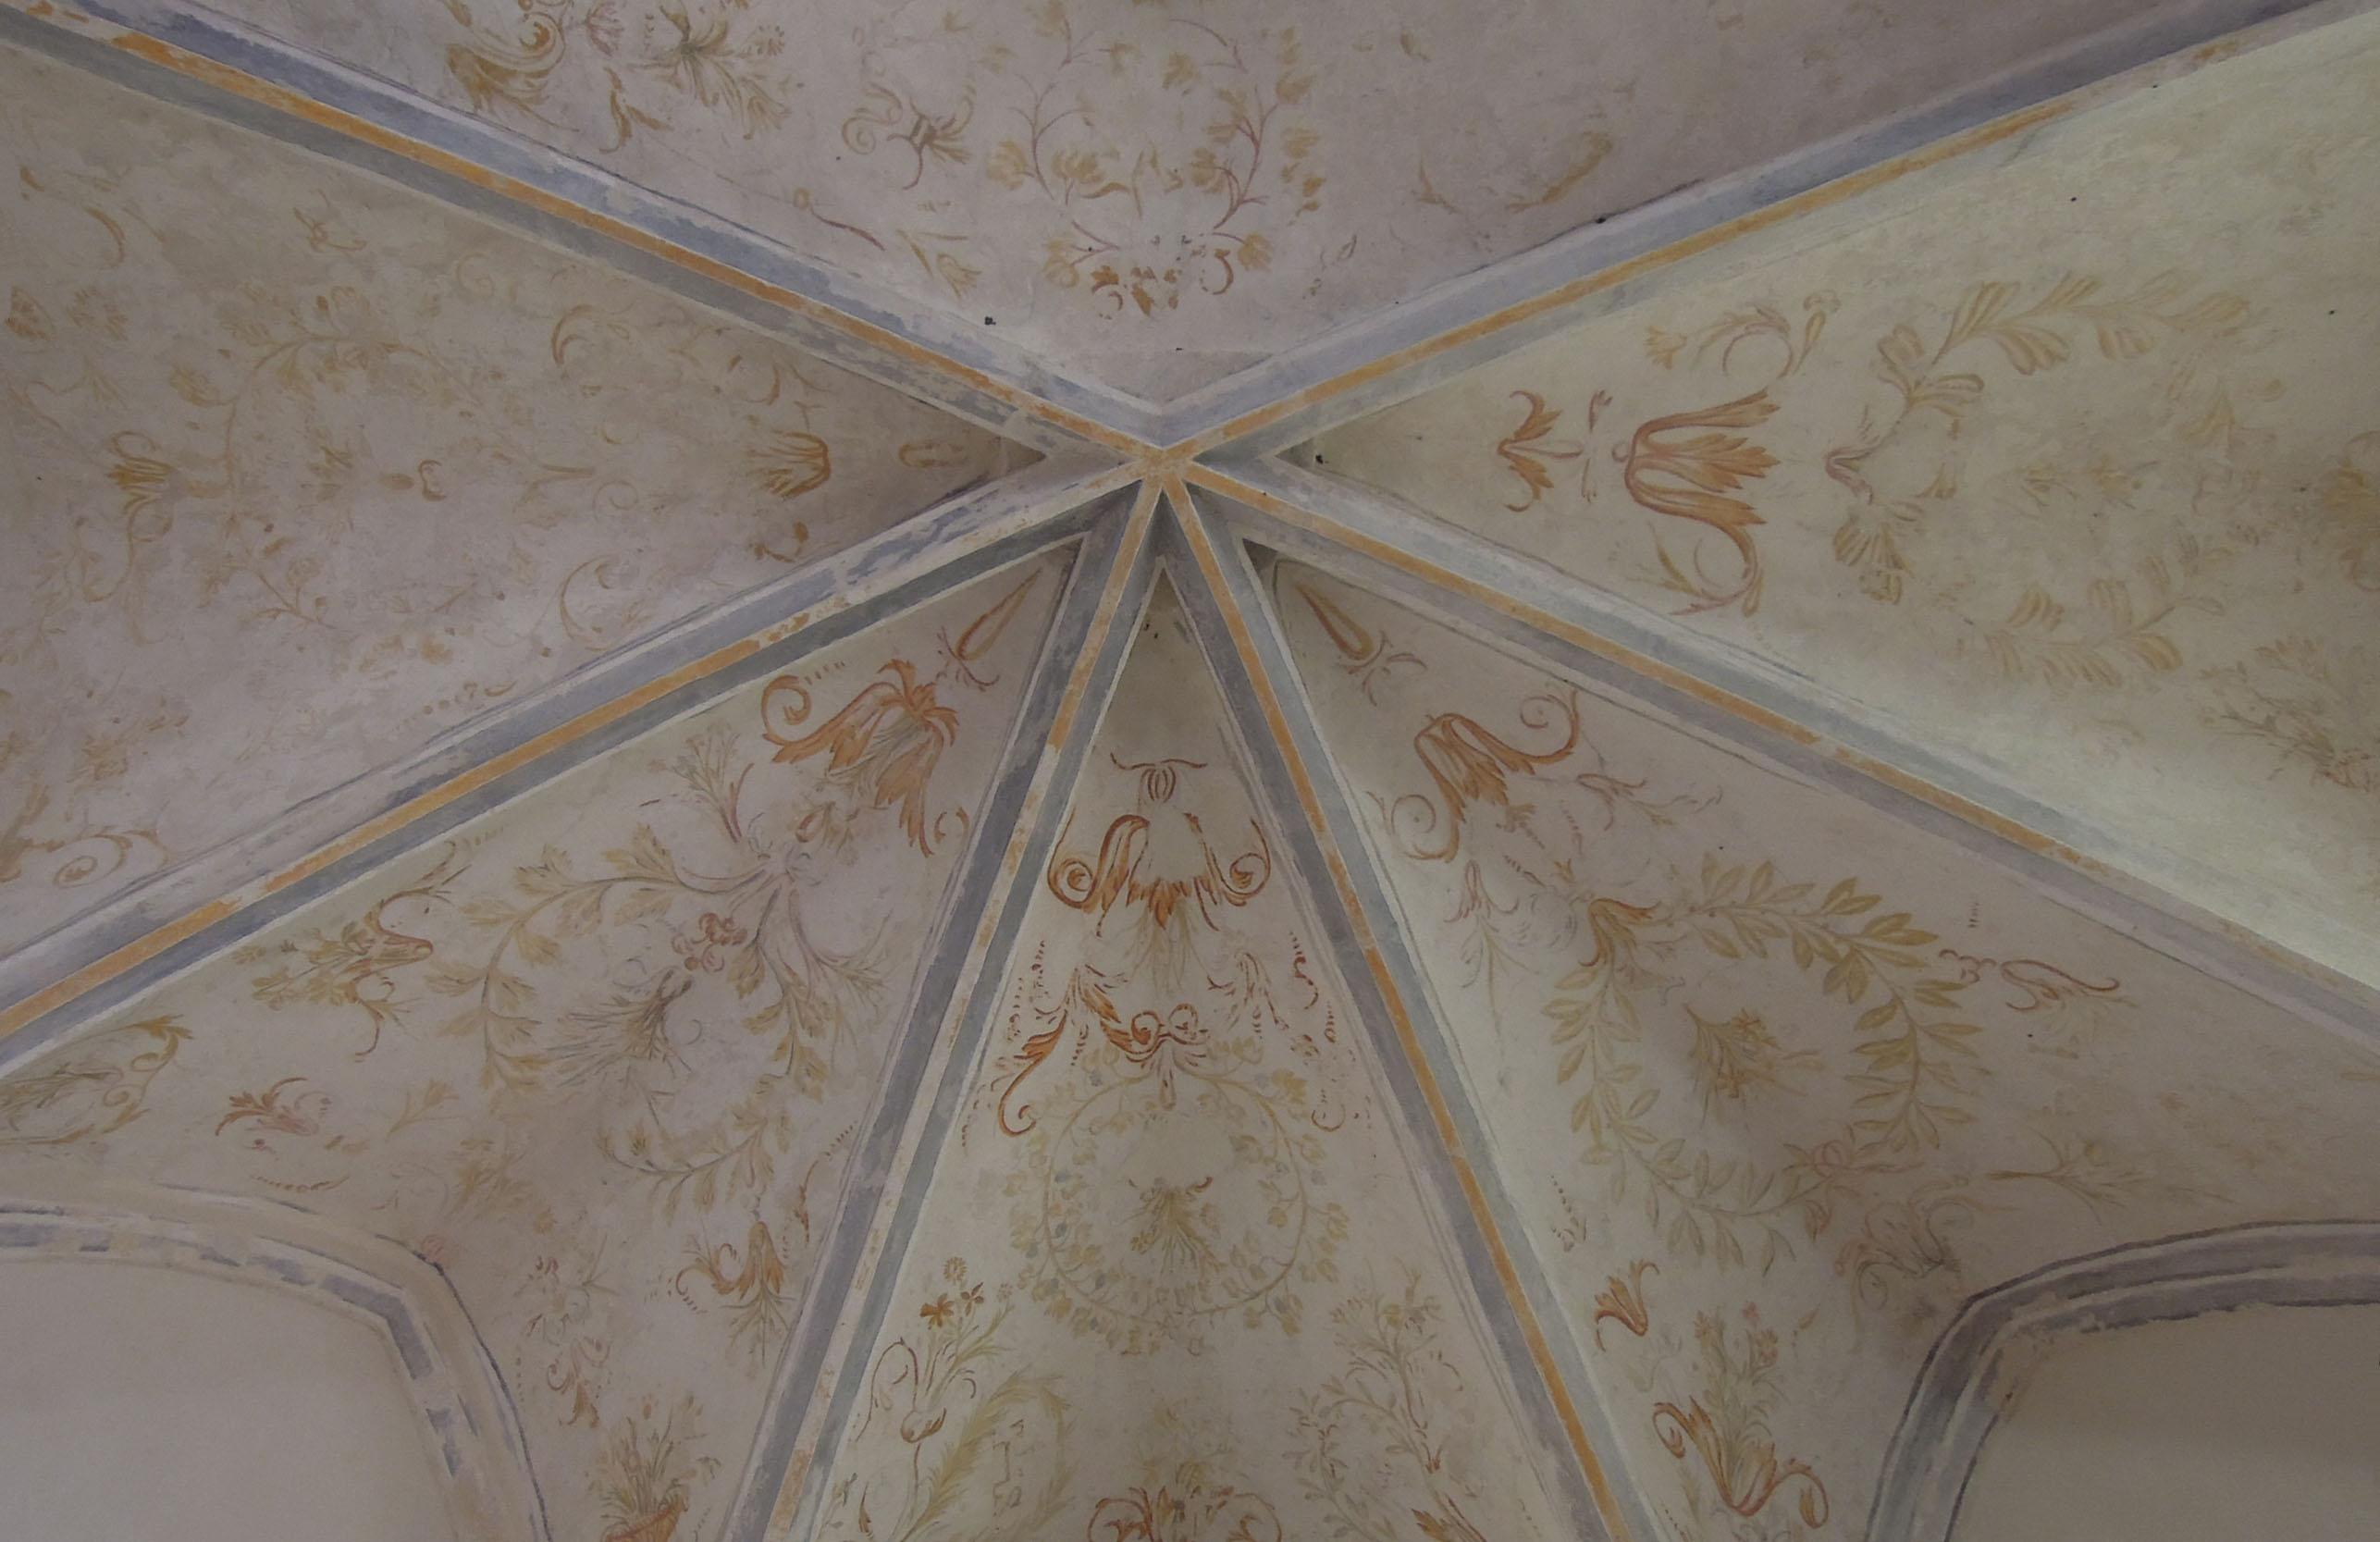 Agence Caillault ACMH – VERTUZEY – Eglise Saint-Gorgon – Voûtes du choeur après restauration( XVIIe siècle)